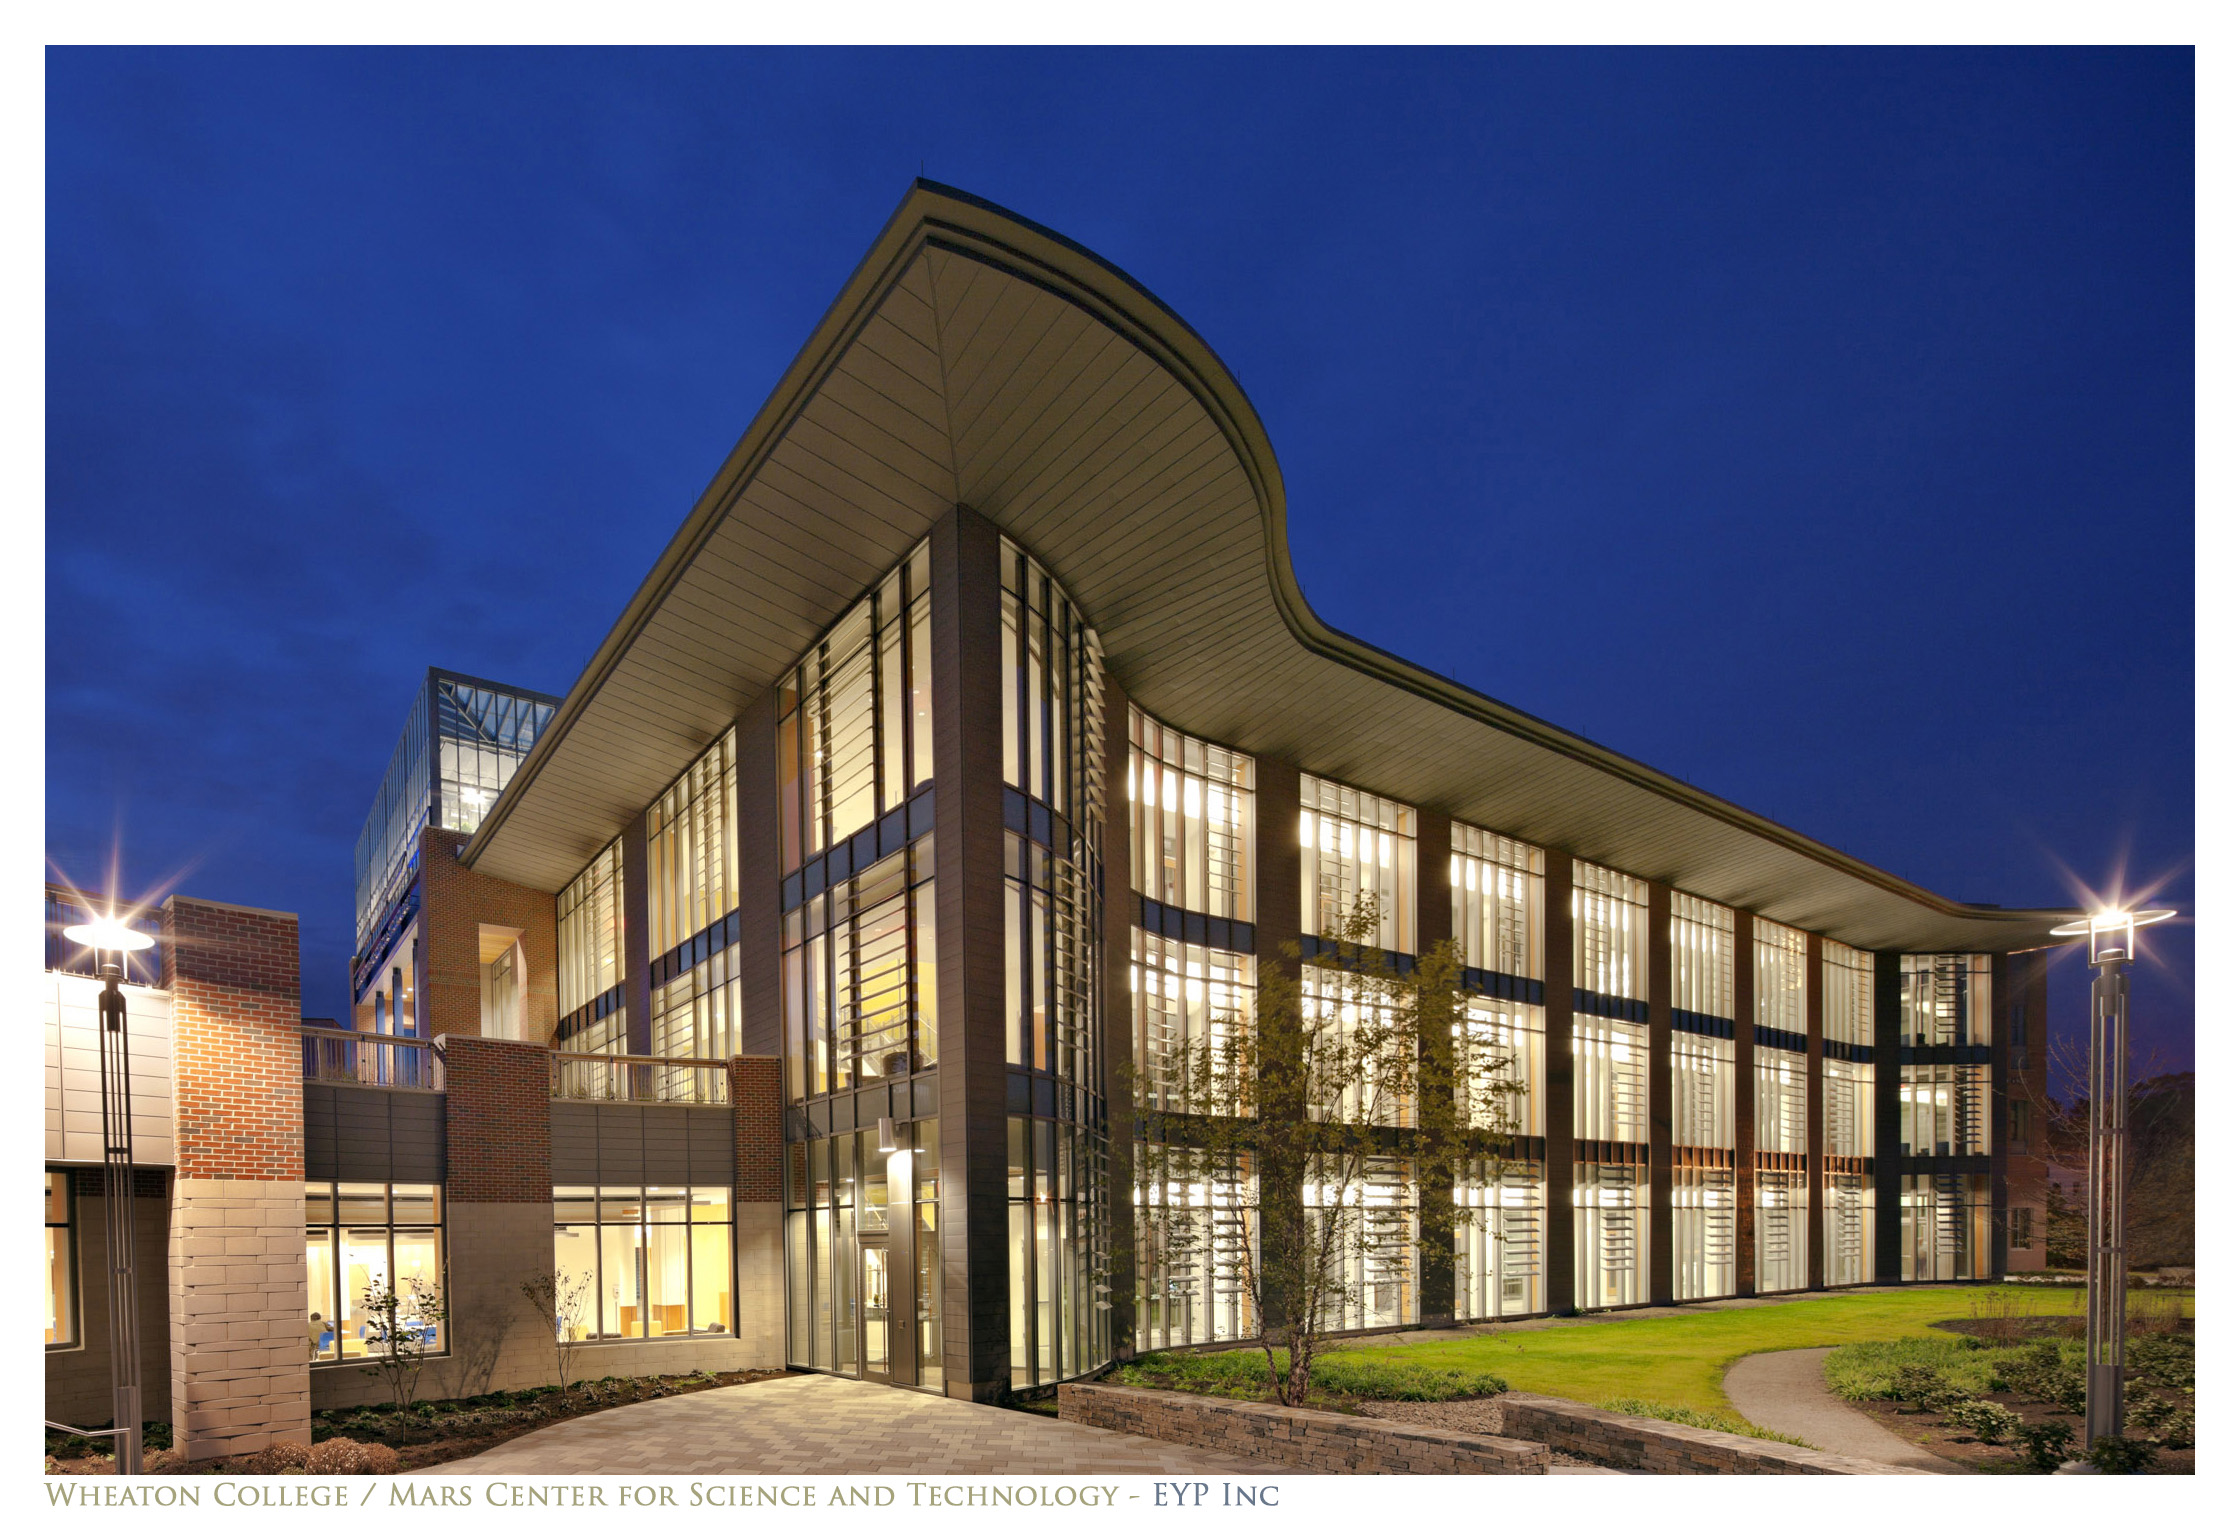 027_Robert-Benson-Photography-EYP-Wheaton-College-Center-Science-Technology-07.jpg